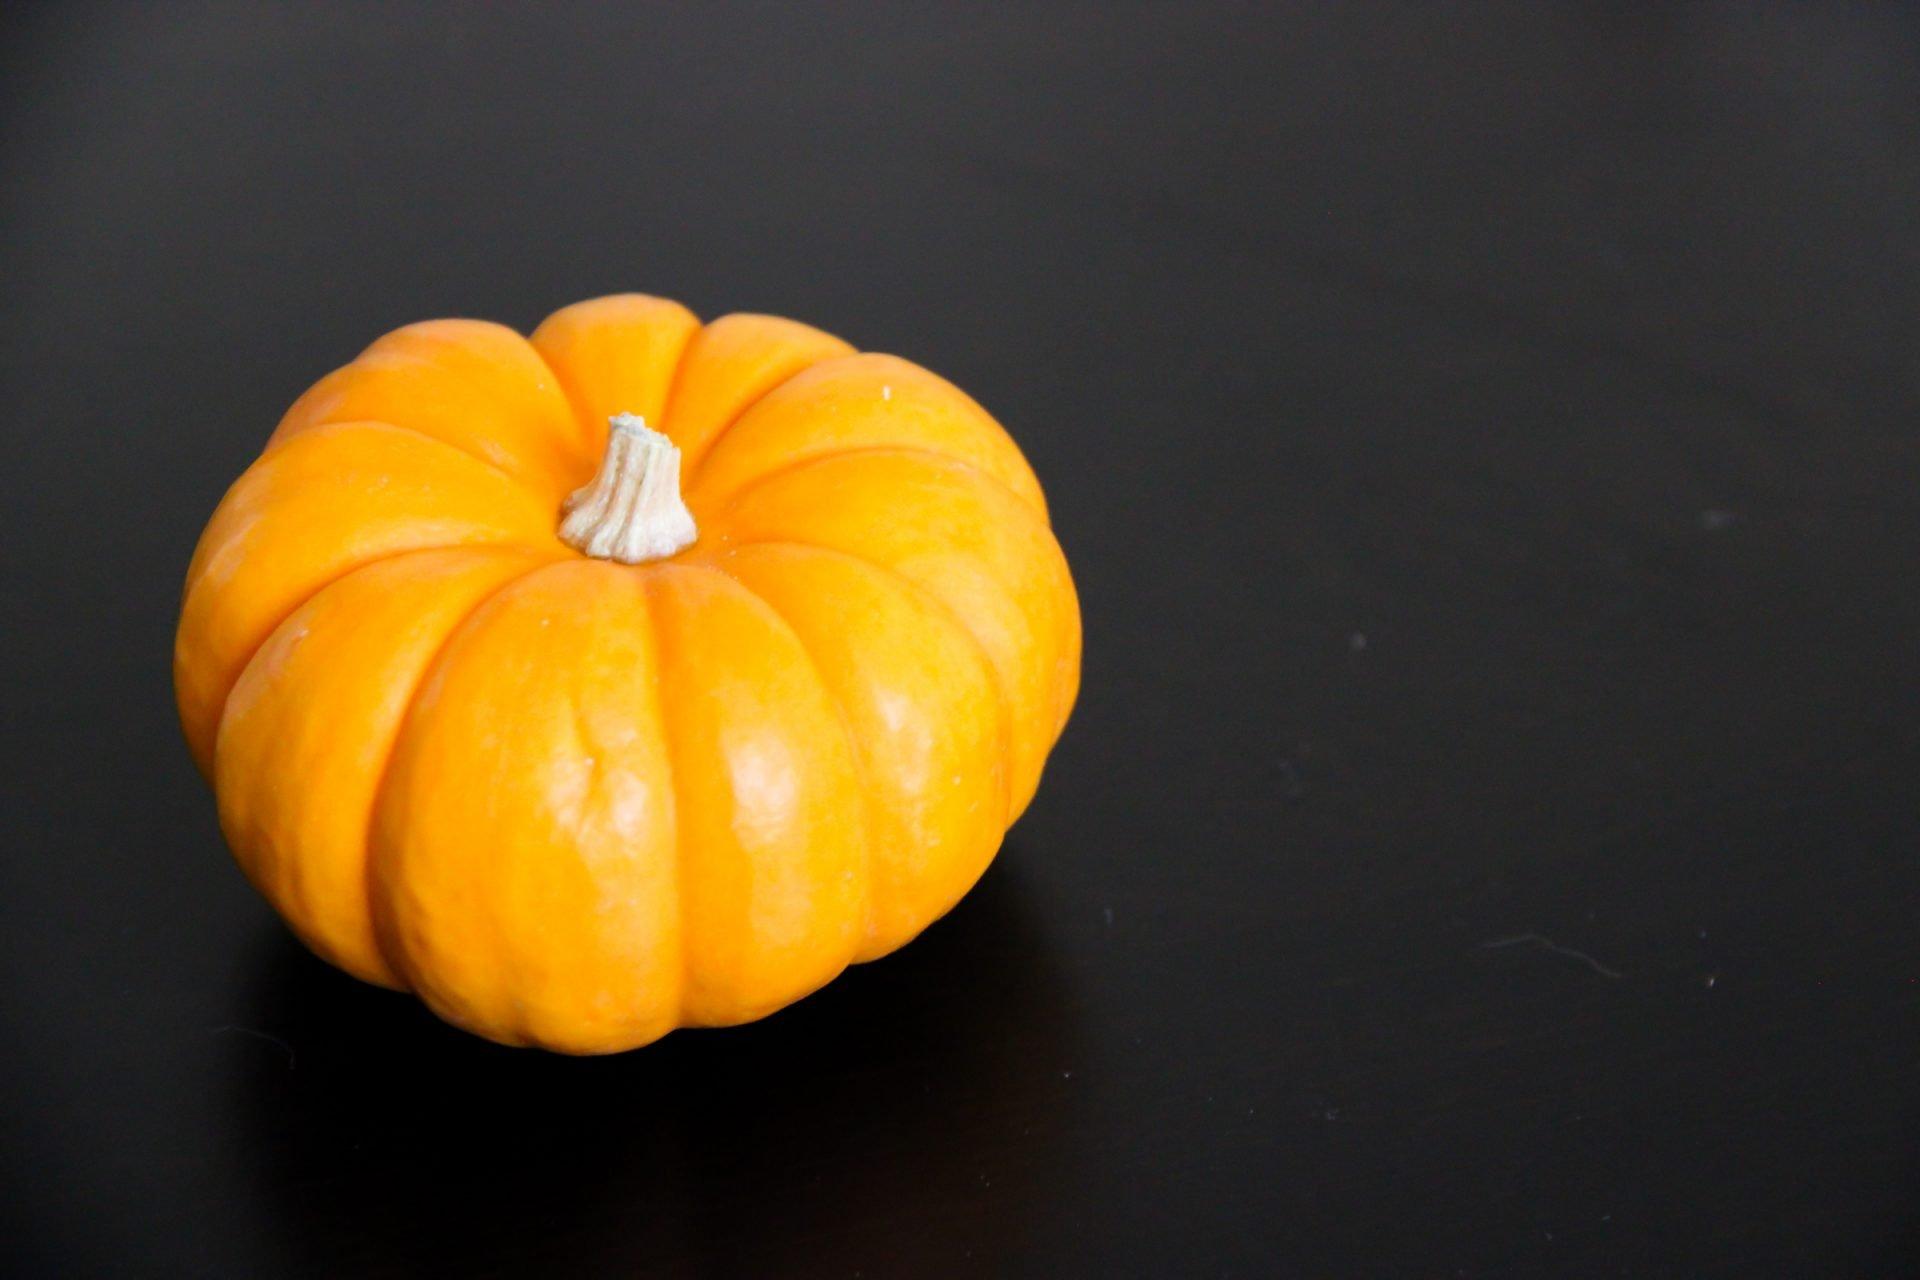 Small Orange Pumpkin on Dark Table